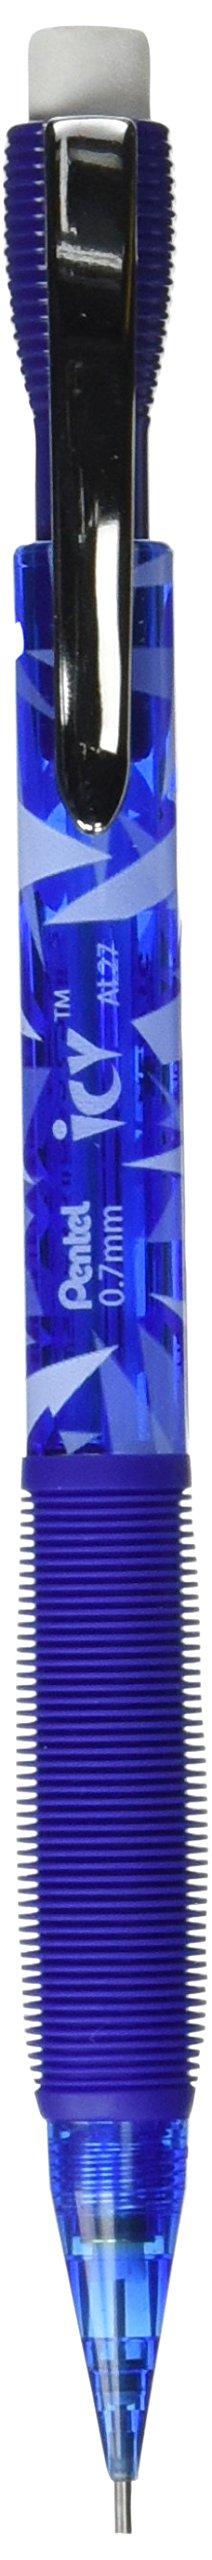 Lapiz automati, .7mm, Refillable, 24/PK, Blue, Sold as 1...